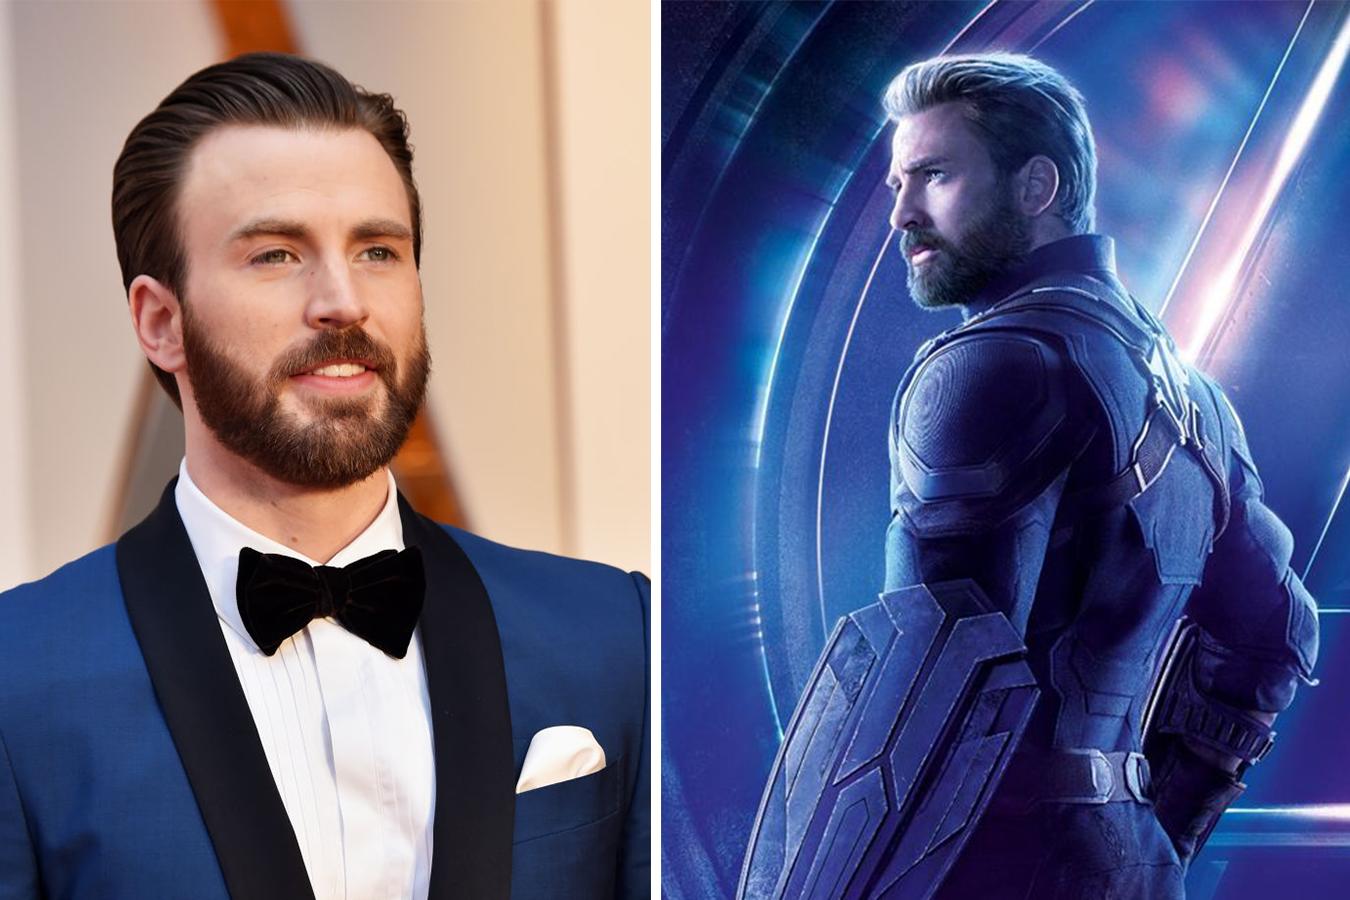 Chris Evans and Captain America